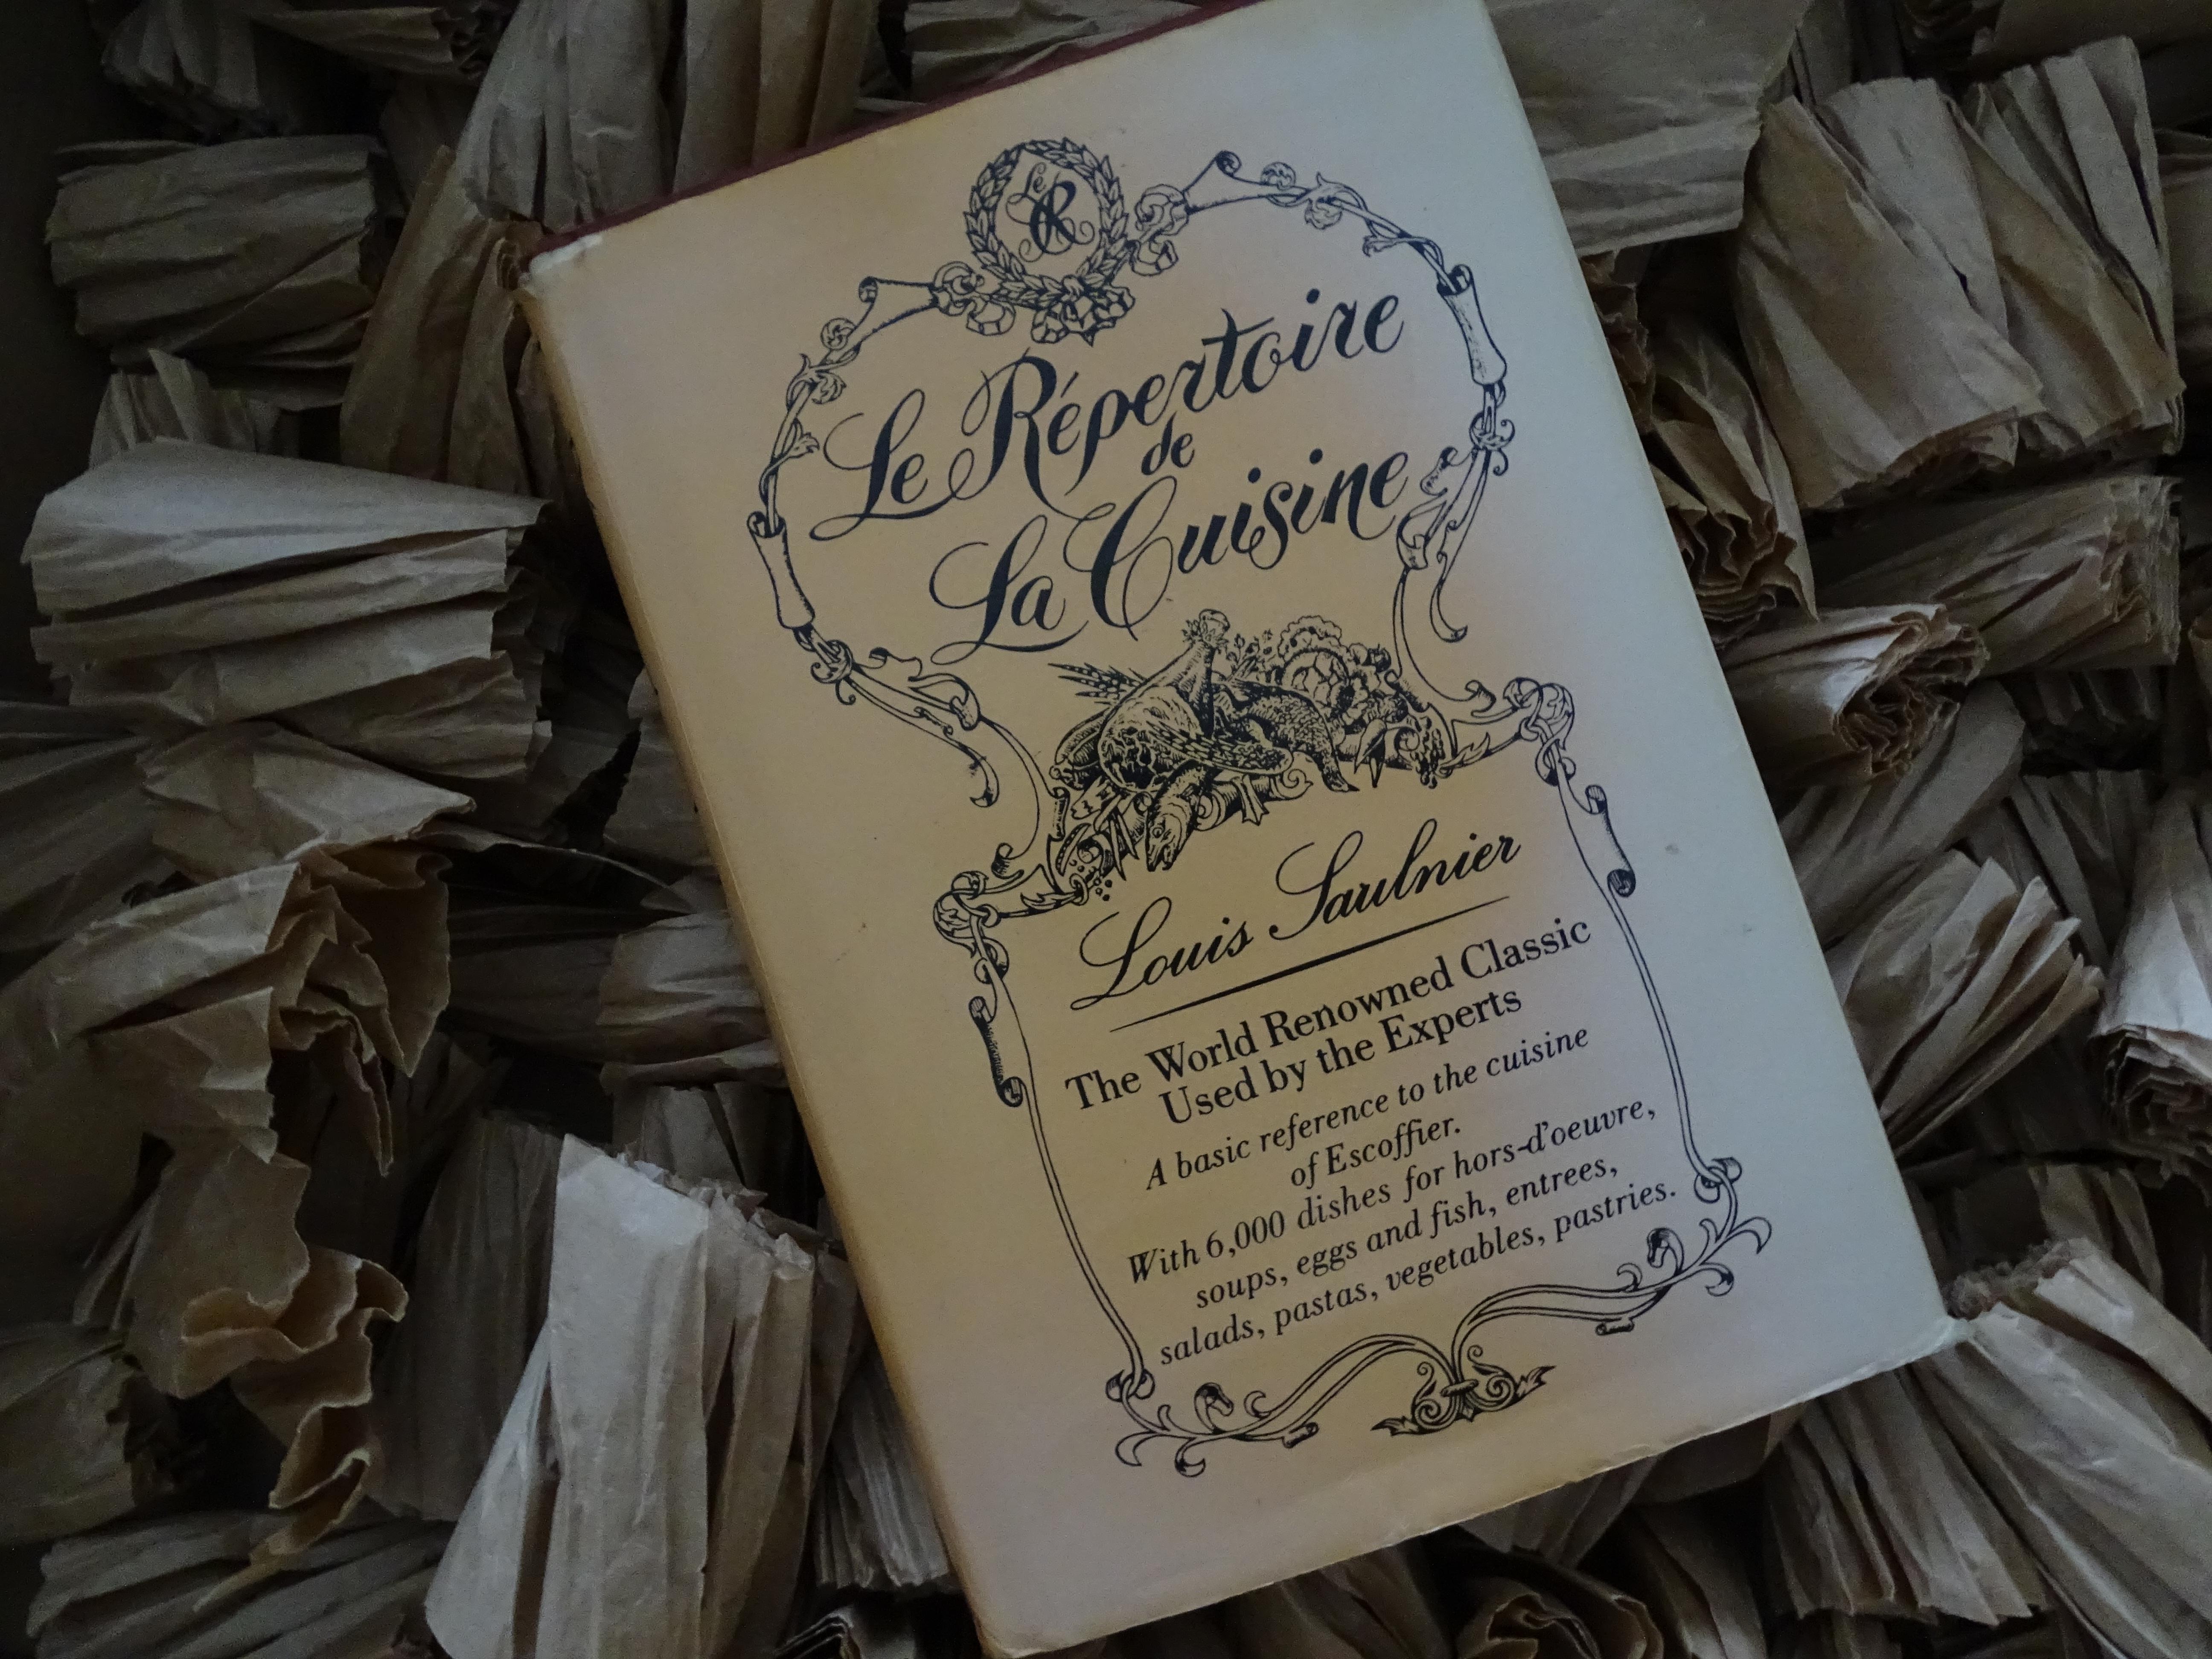 copy, Le Repertoire de La Cuisine book